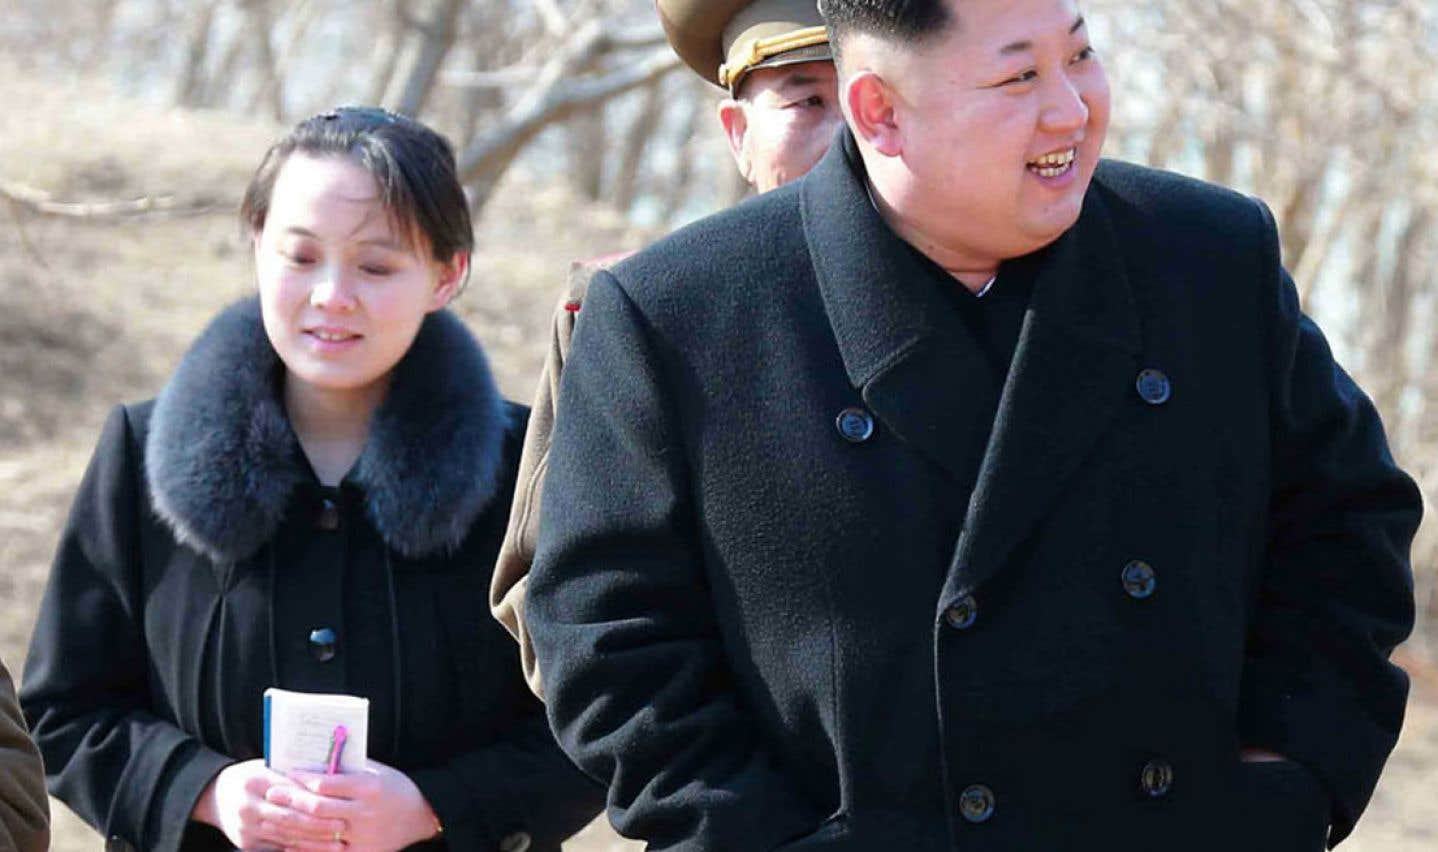 De gauche à droite:Kim Yo-jong et son frère, Kim Jong-un